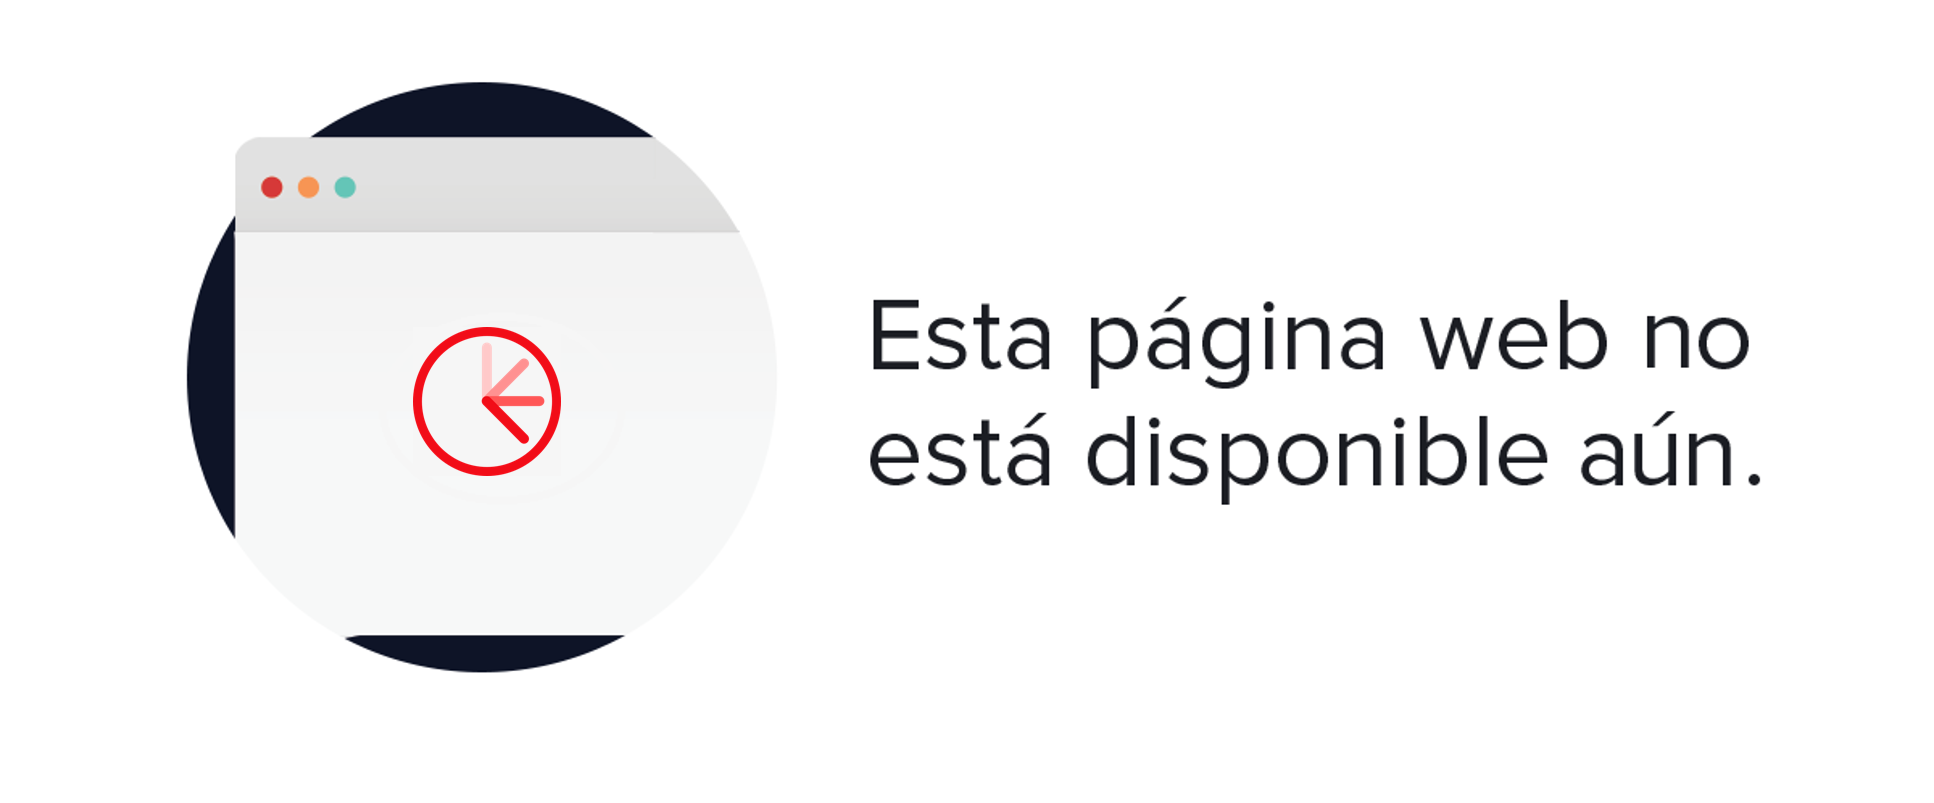 Ralph Lauren Marrón Zapatillas Deportivas Hombre 463579 - Barato - GWIXAJQ